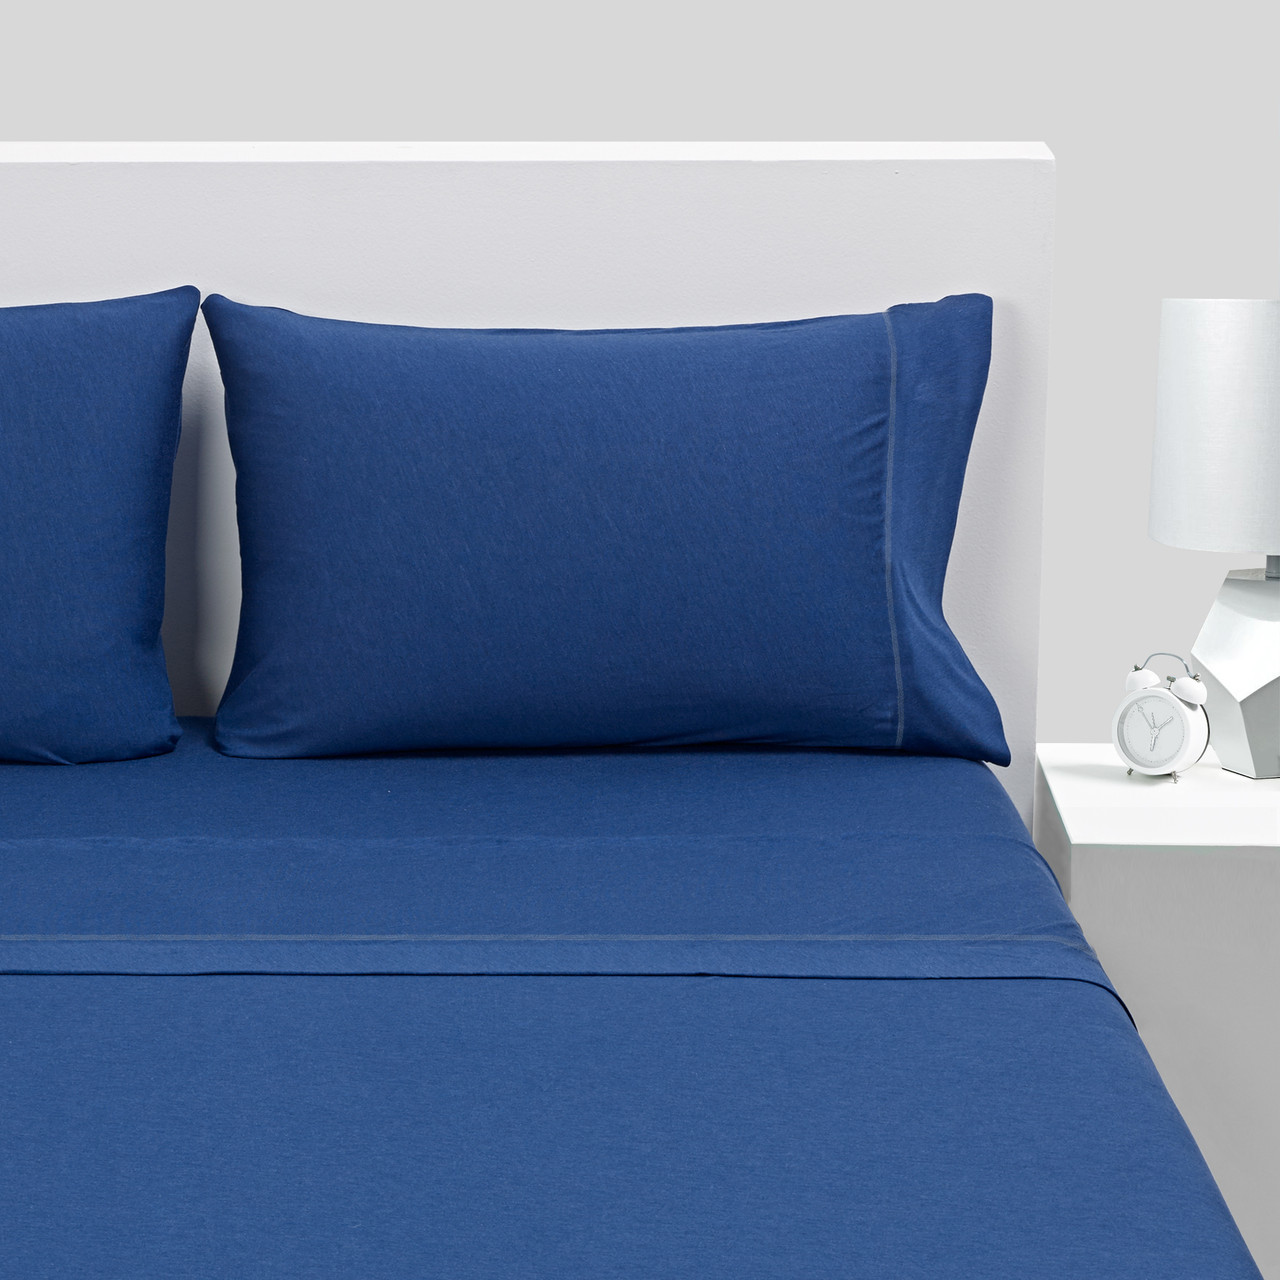 Bedgear Hyper-Wool Technology Performance Wool Sheet Set - Navy- King - BGS28AMB3FK, 814874021111